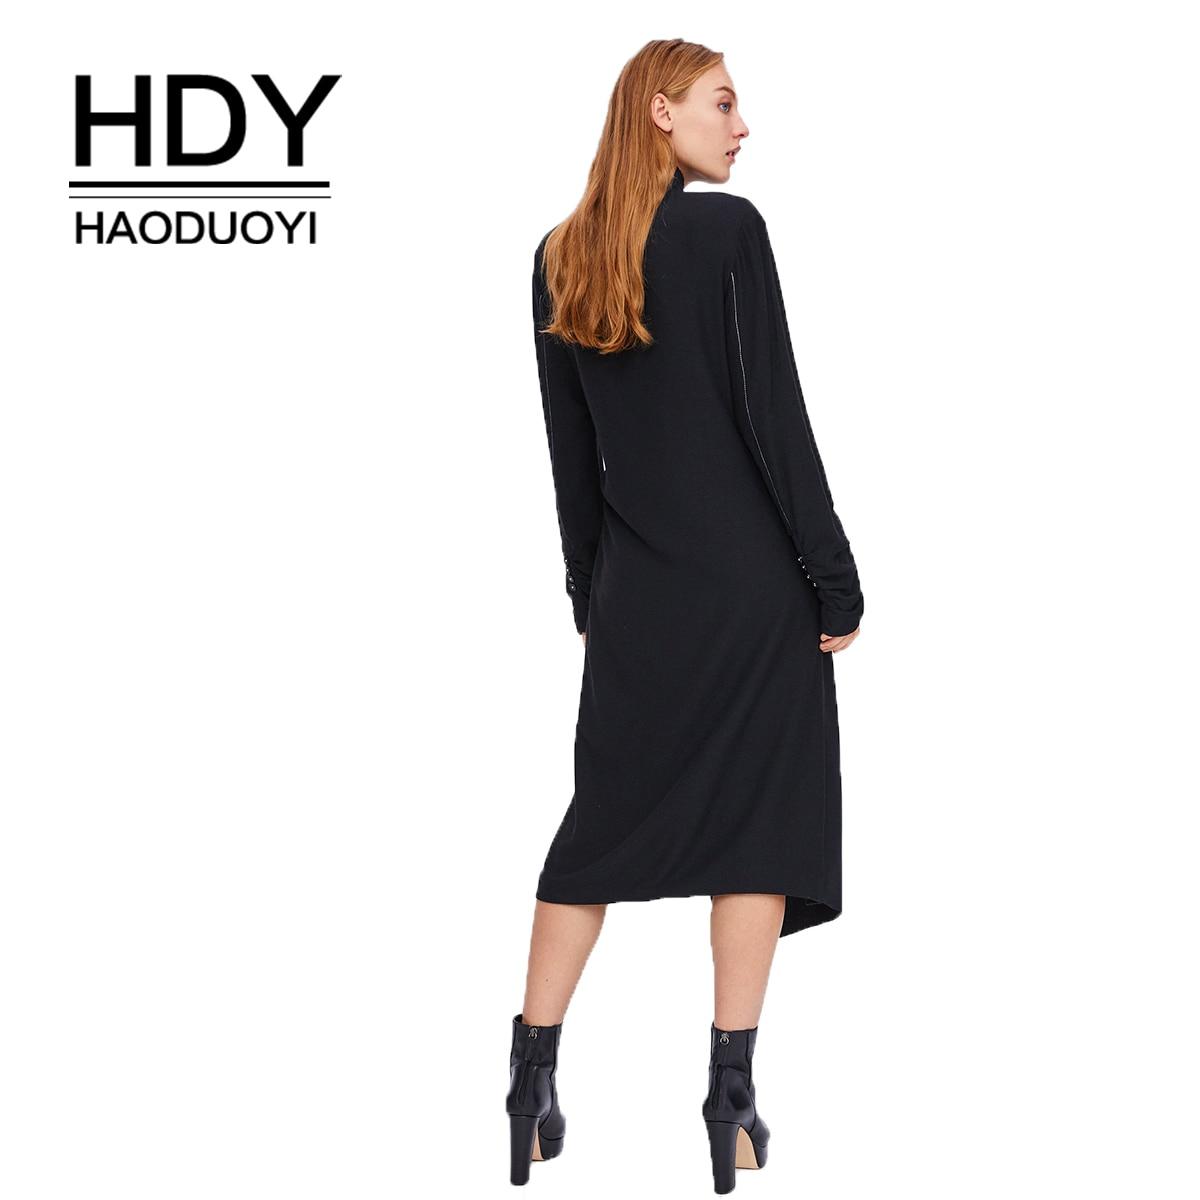 HDY Haoduoyi Black Pressure Line  Wrap Dress autumn Streetwear Elegant Straight Dresses New Solid Color